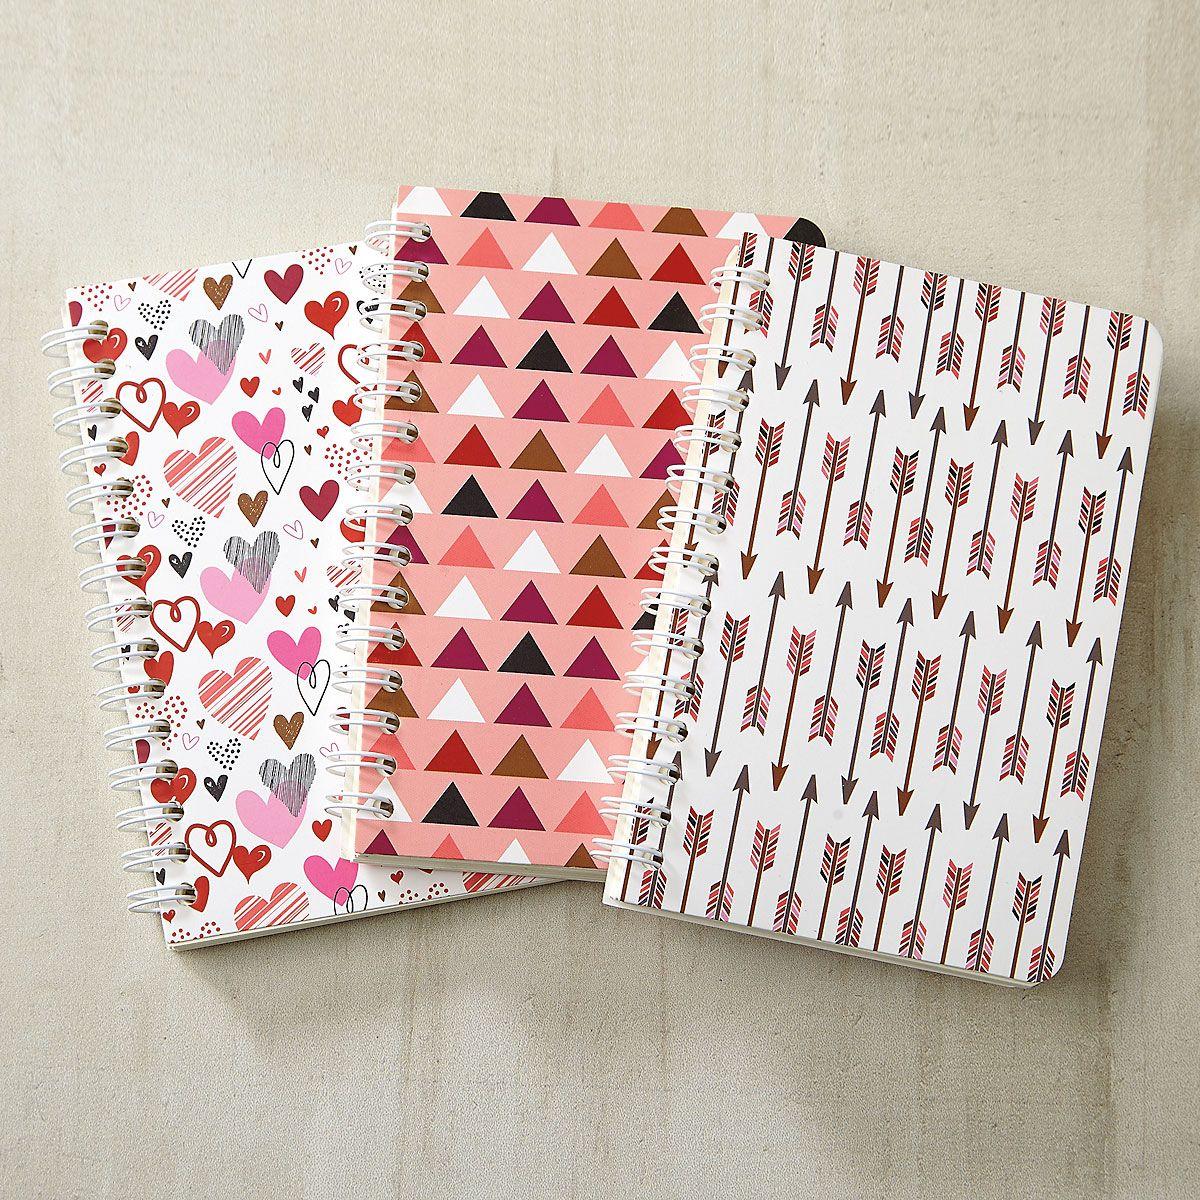 Mini Spiral Notebooks - Buy 1 Get 1 Free